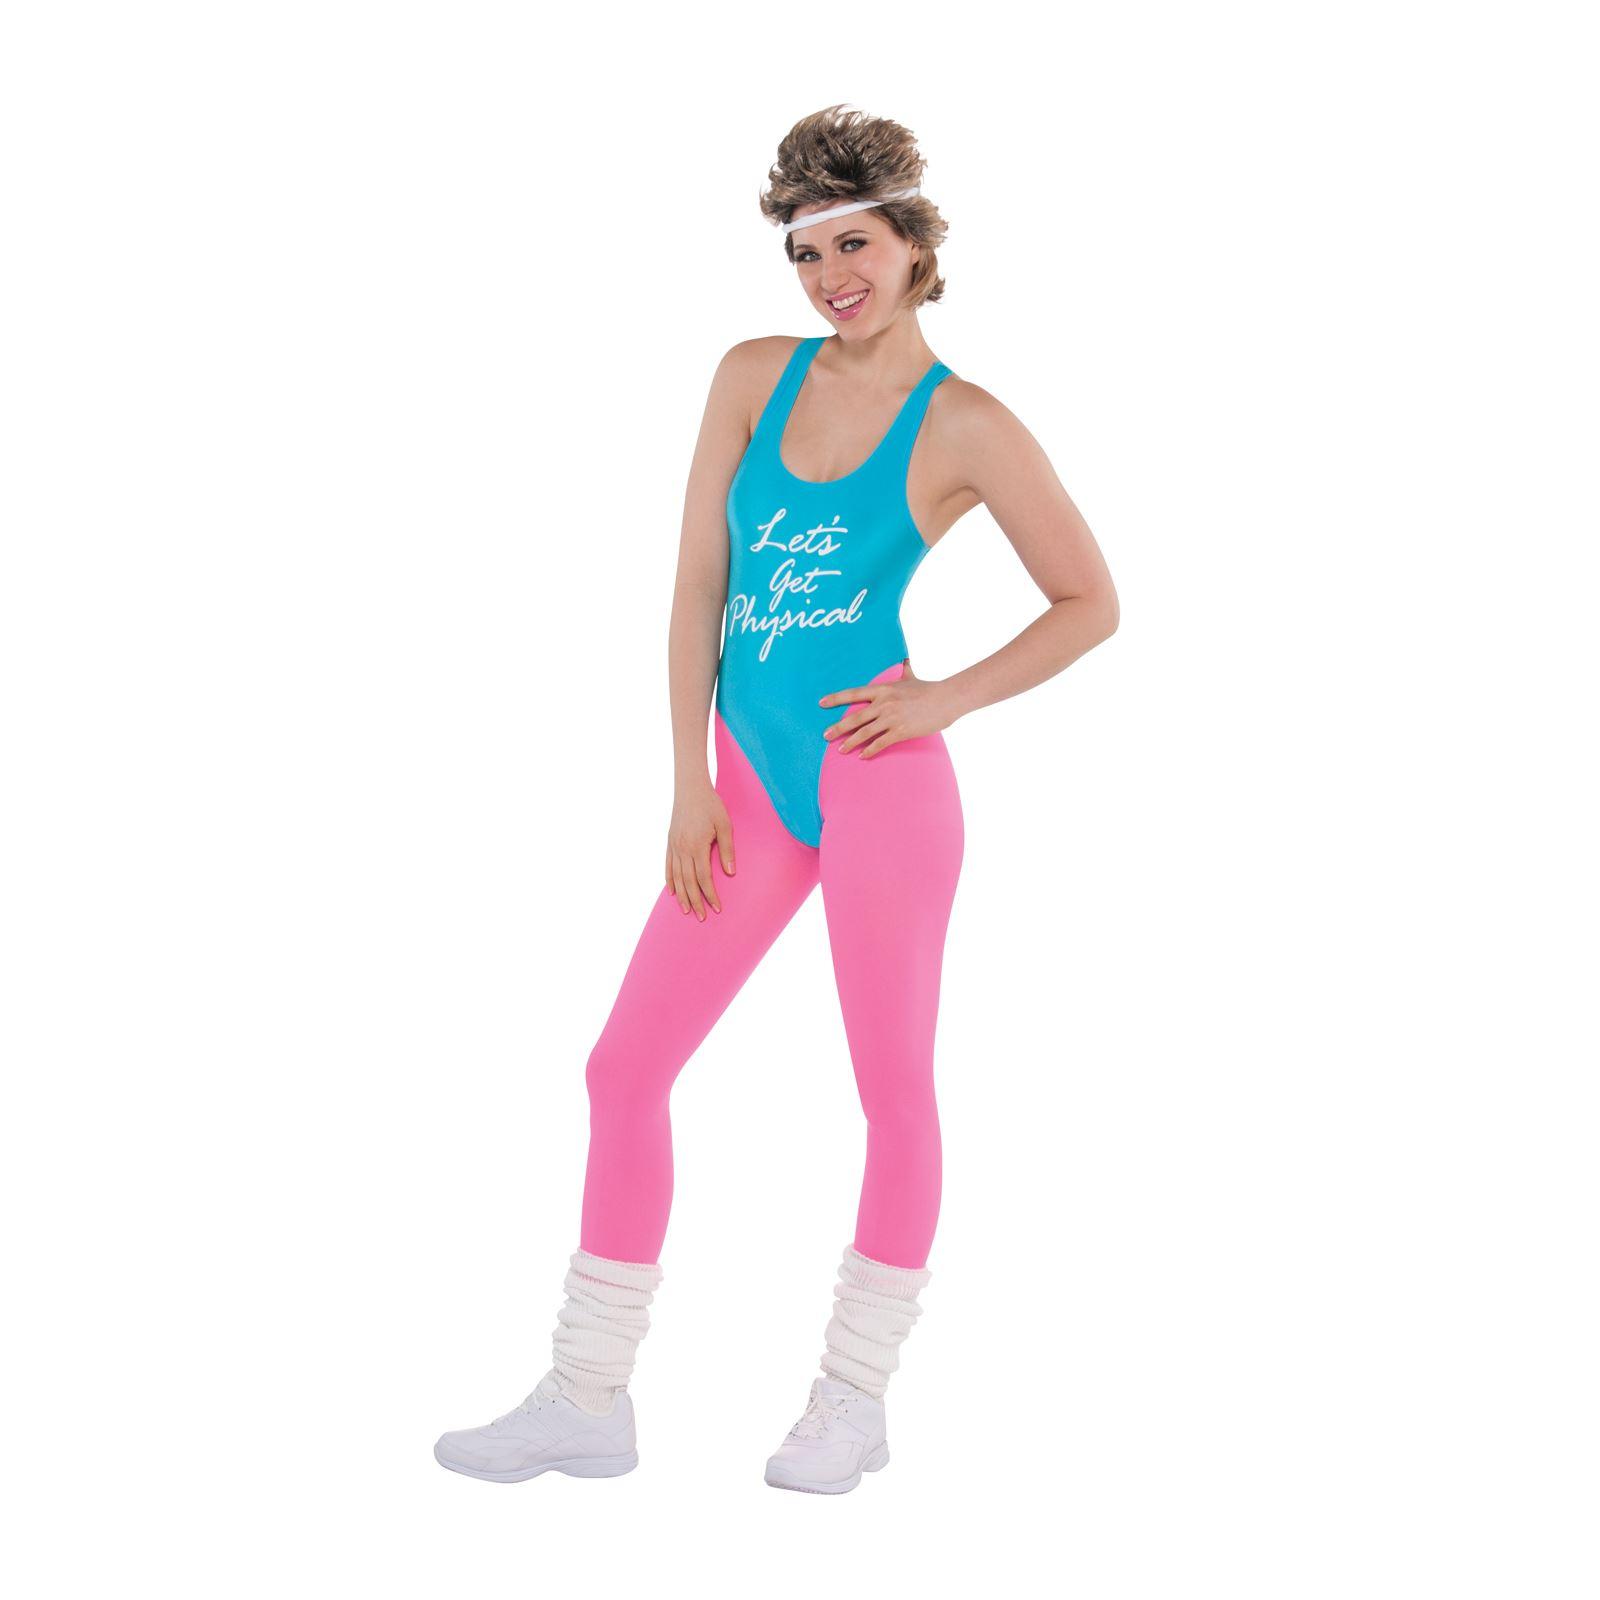 Dance Workout Clothes Uk